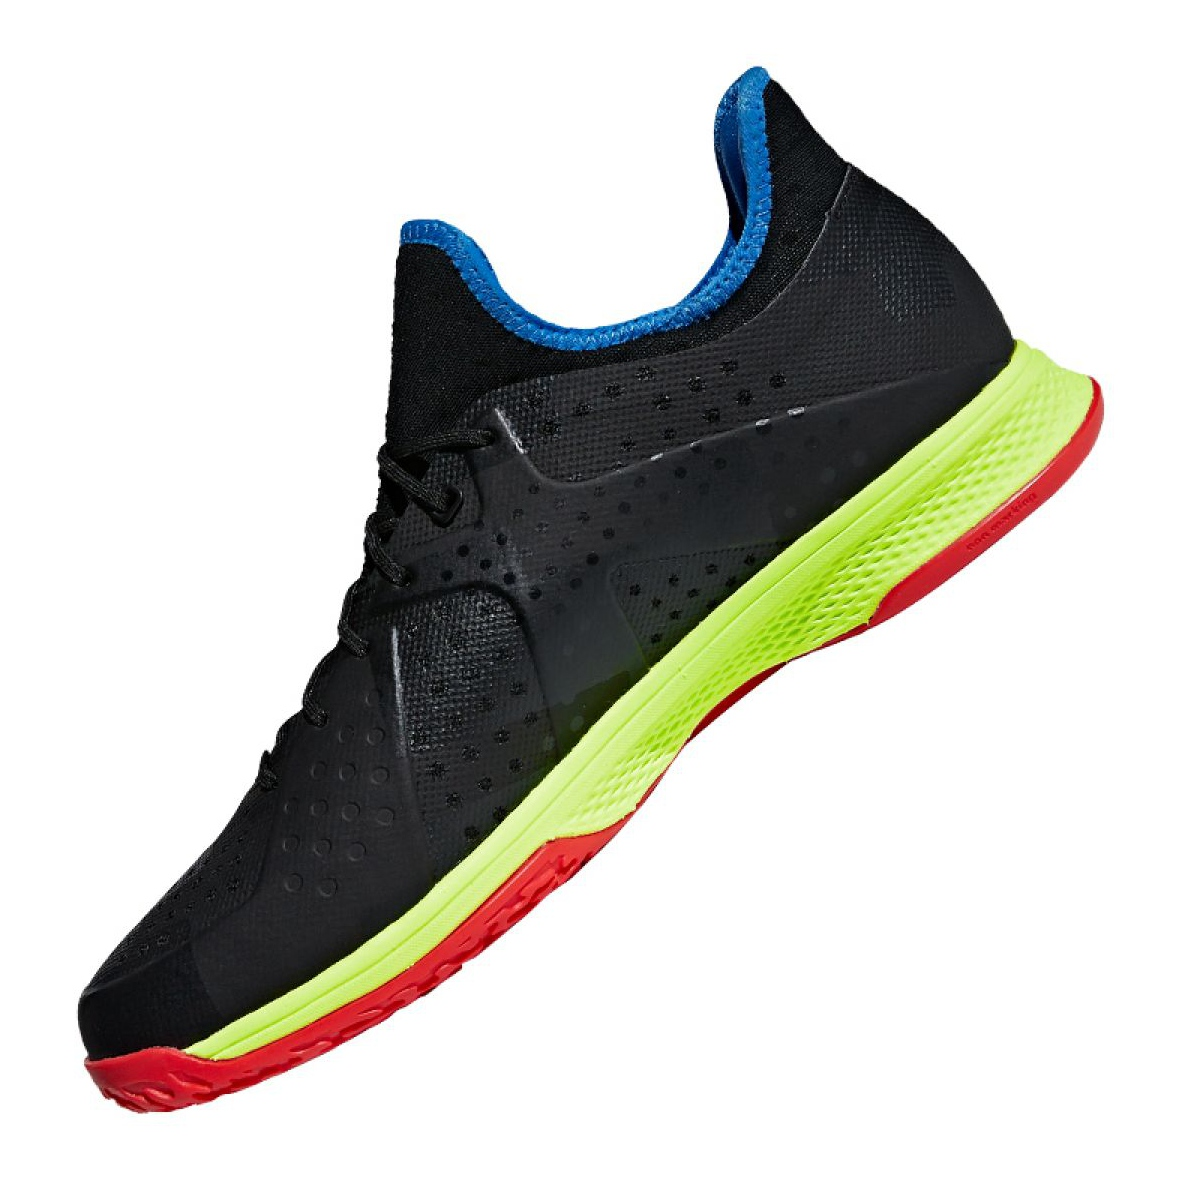 Chaussures Handball De Adidas M Counterblast Bounce Bd7408